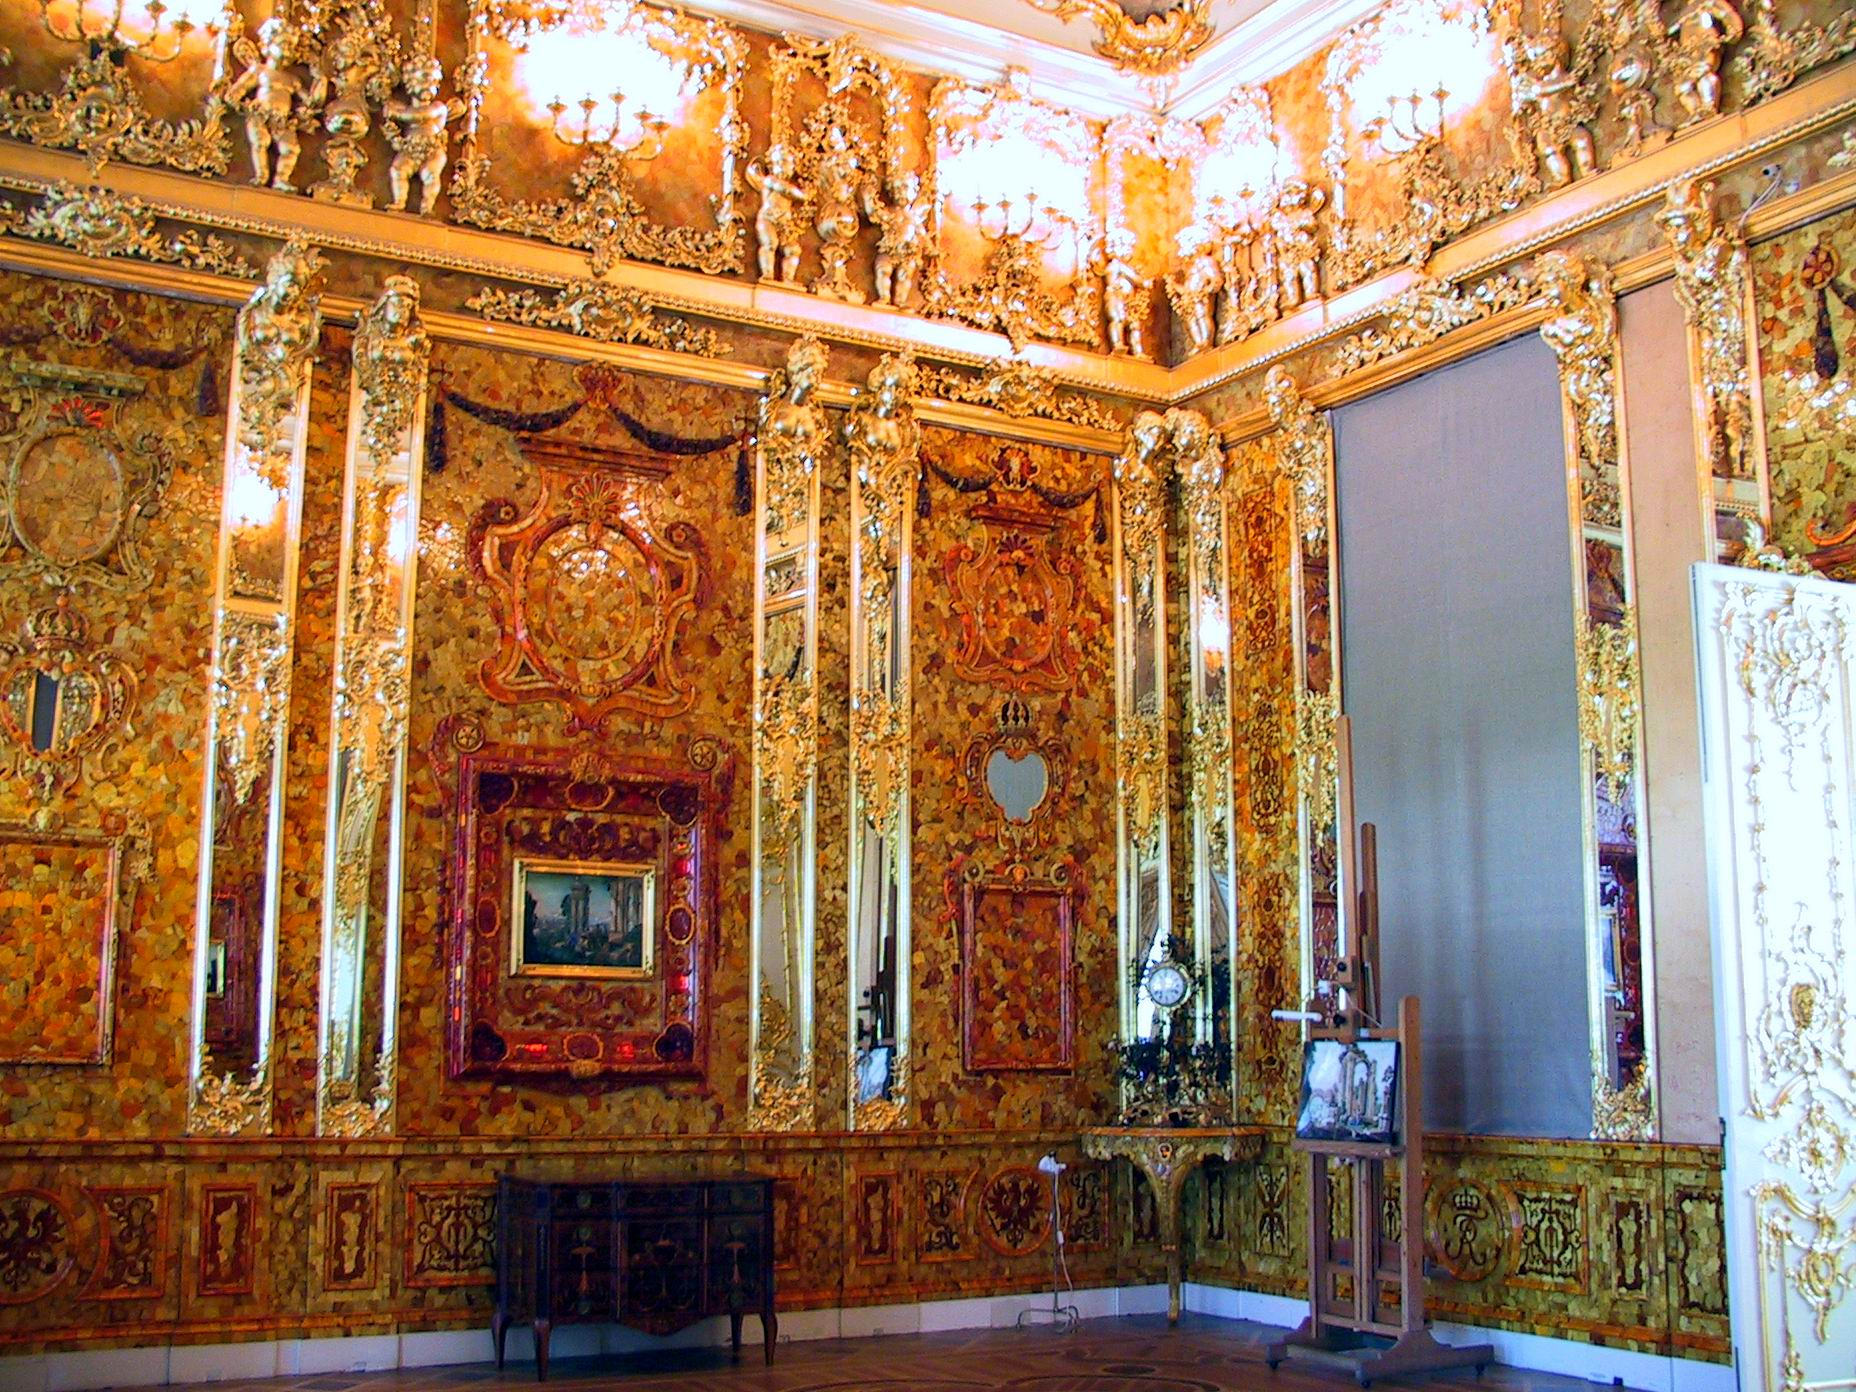 B5--05 Amber Roomof Catherine Palace, St. Petersburg, Russia